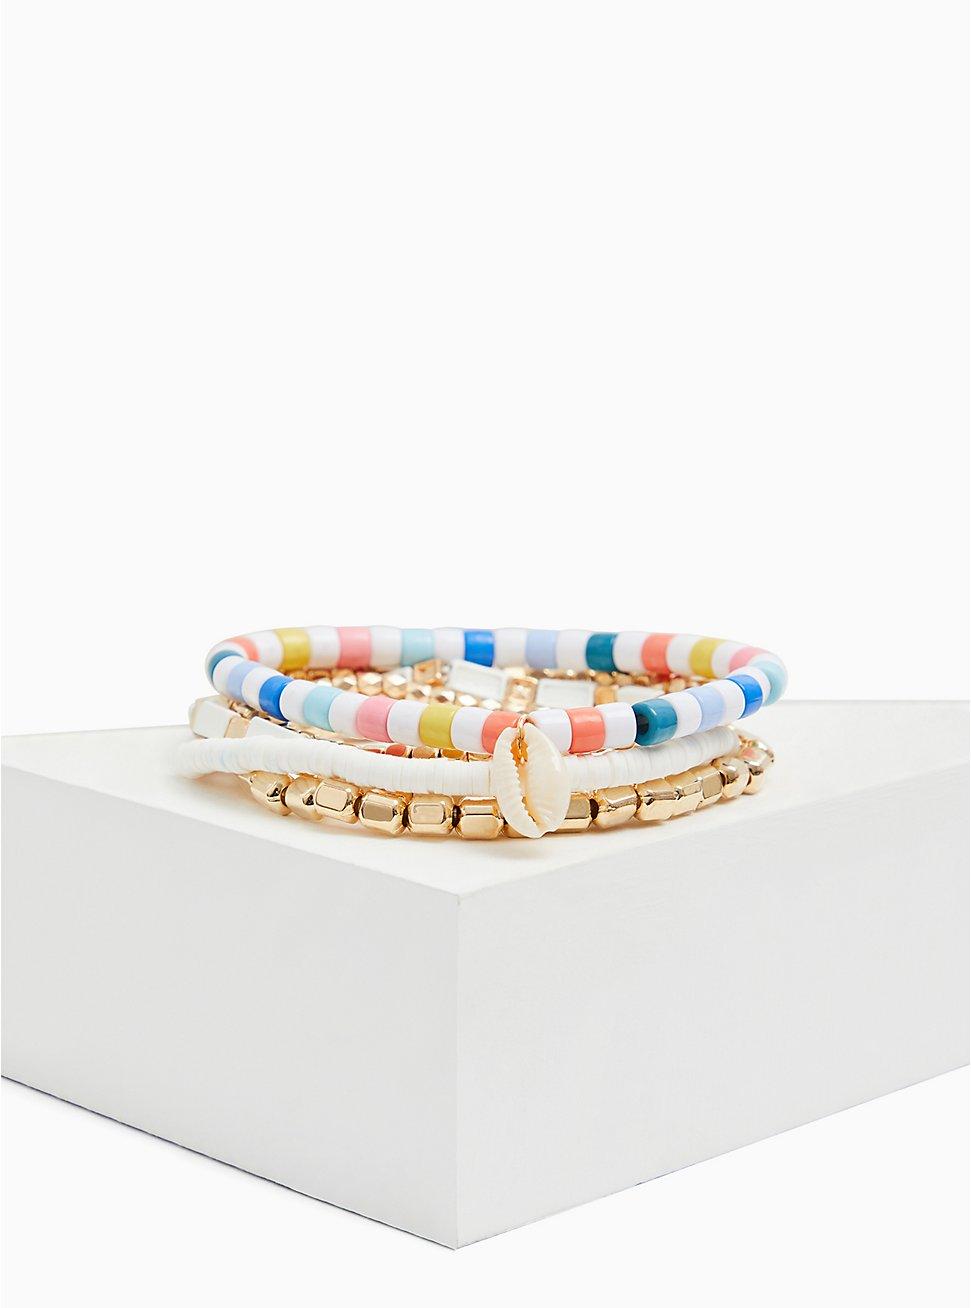 Gold-Tone & White Beaded Stretch Bracelet Set - Set of 5, MULTI, hi-res